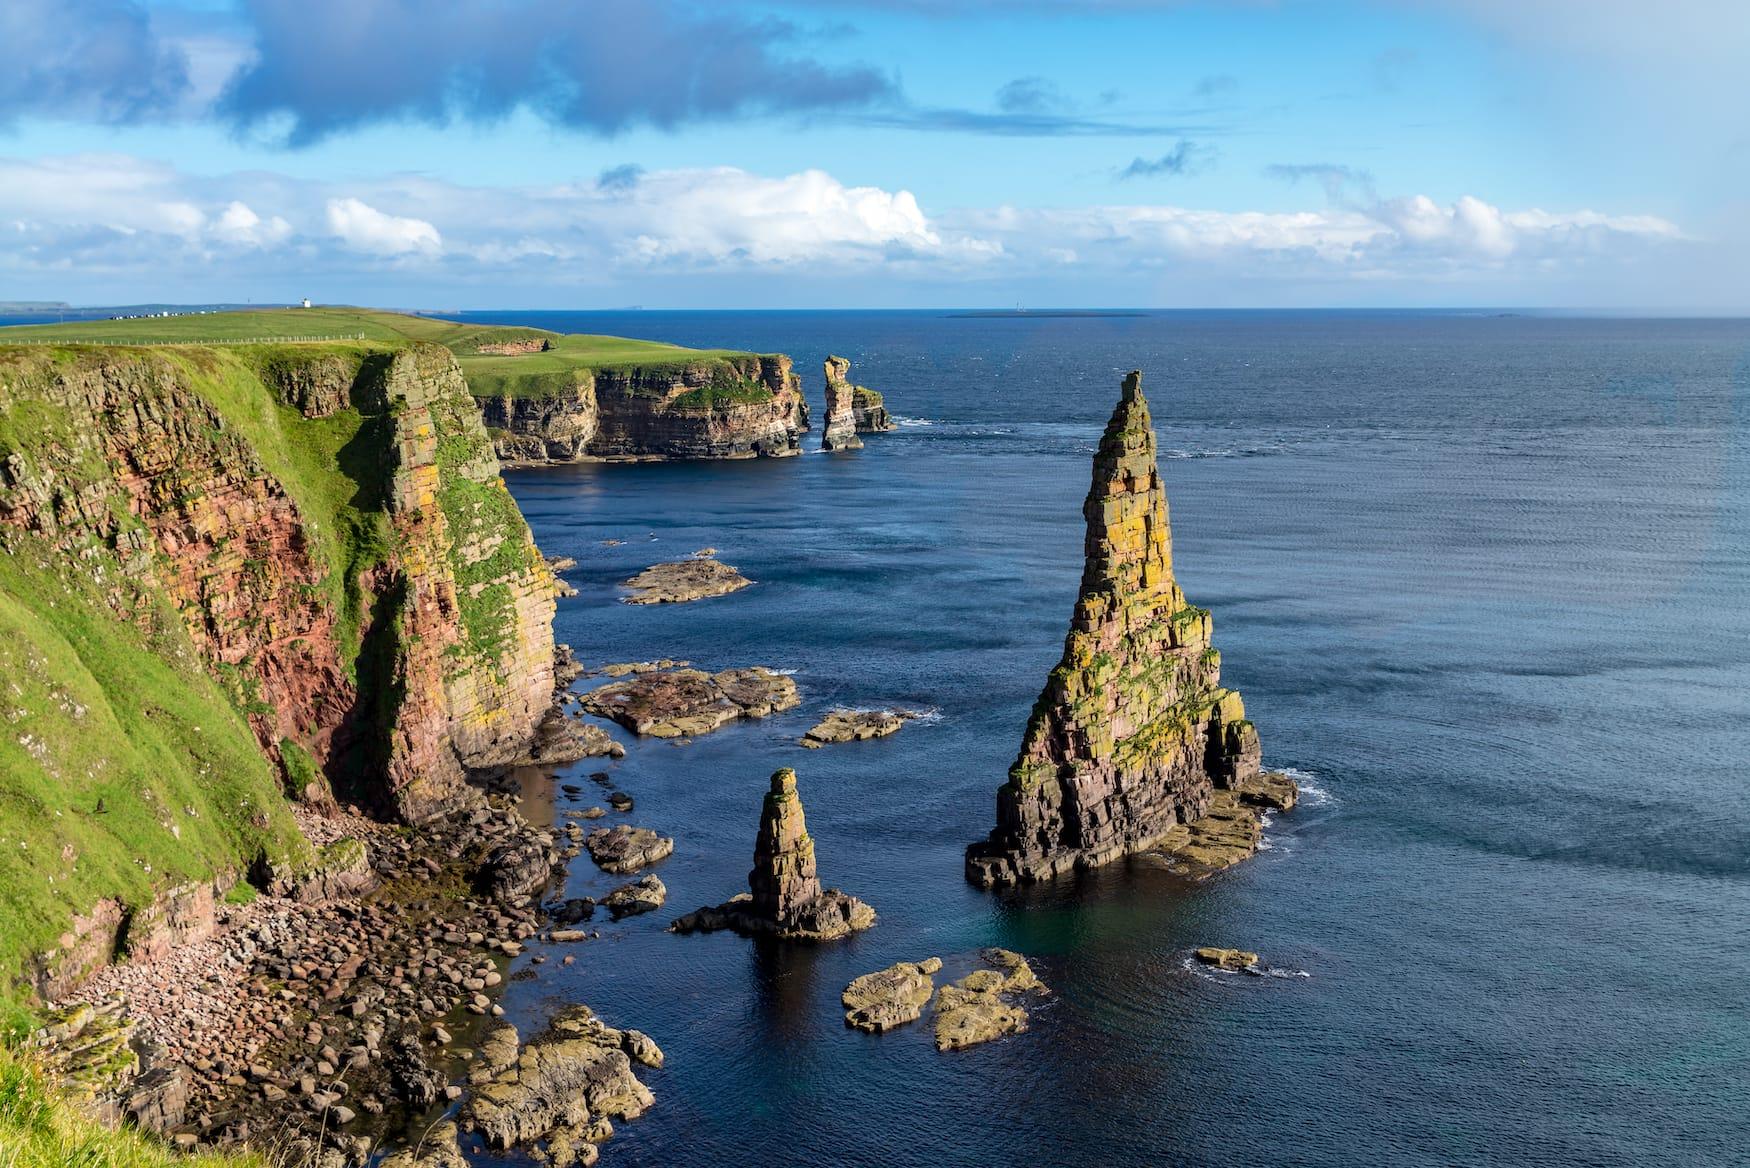 Felsen im Meer vor der Küste in Schottland